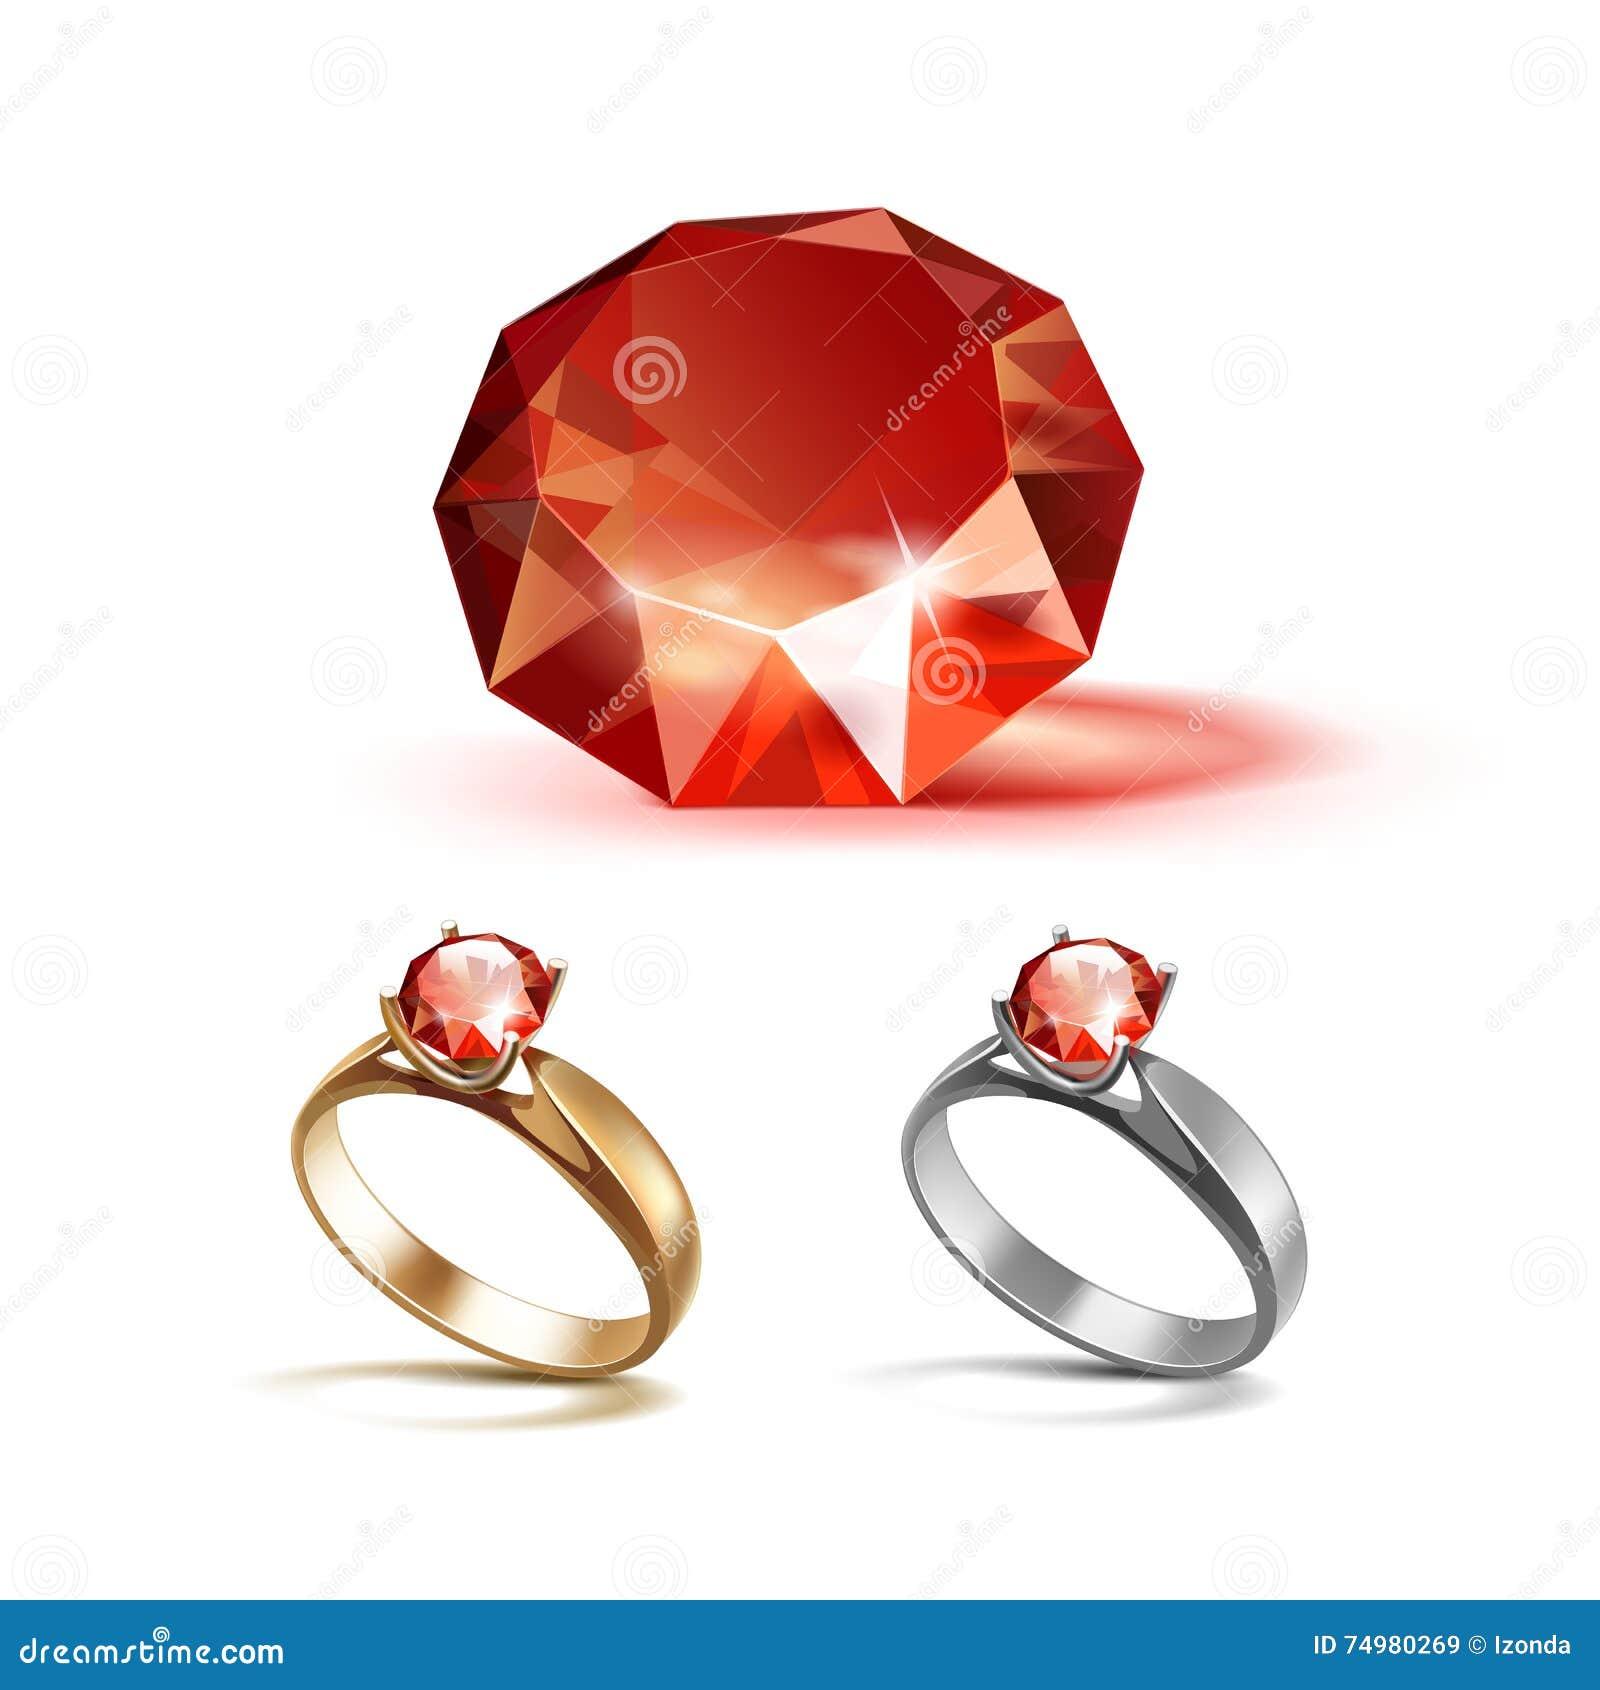 Gold Und Silber Verlobungsringe Mit Rotem Glanzendem Klarem